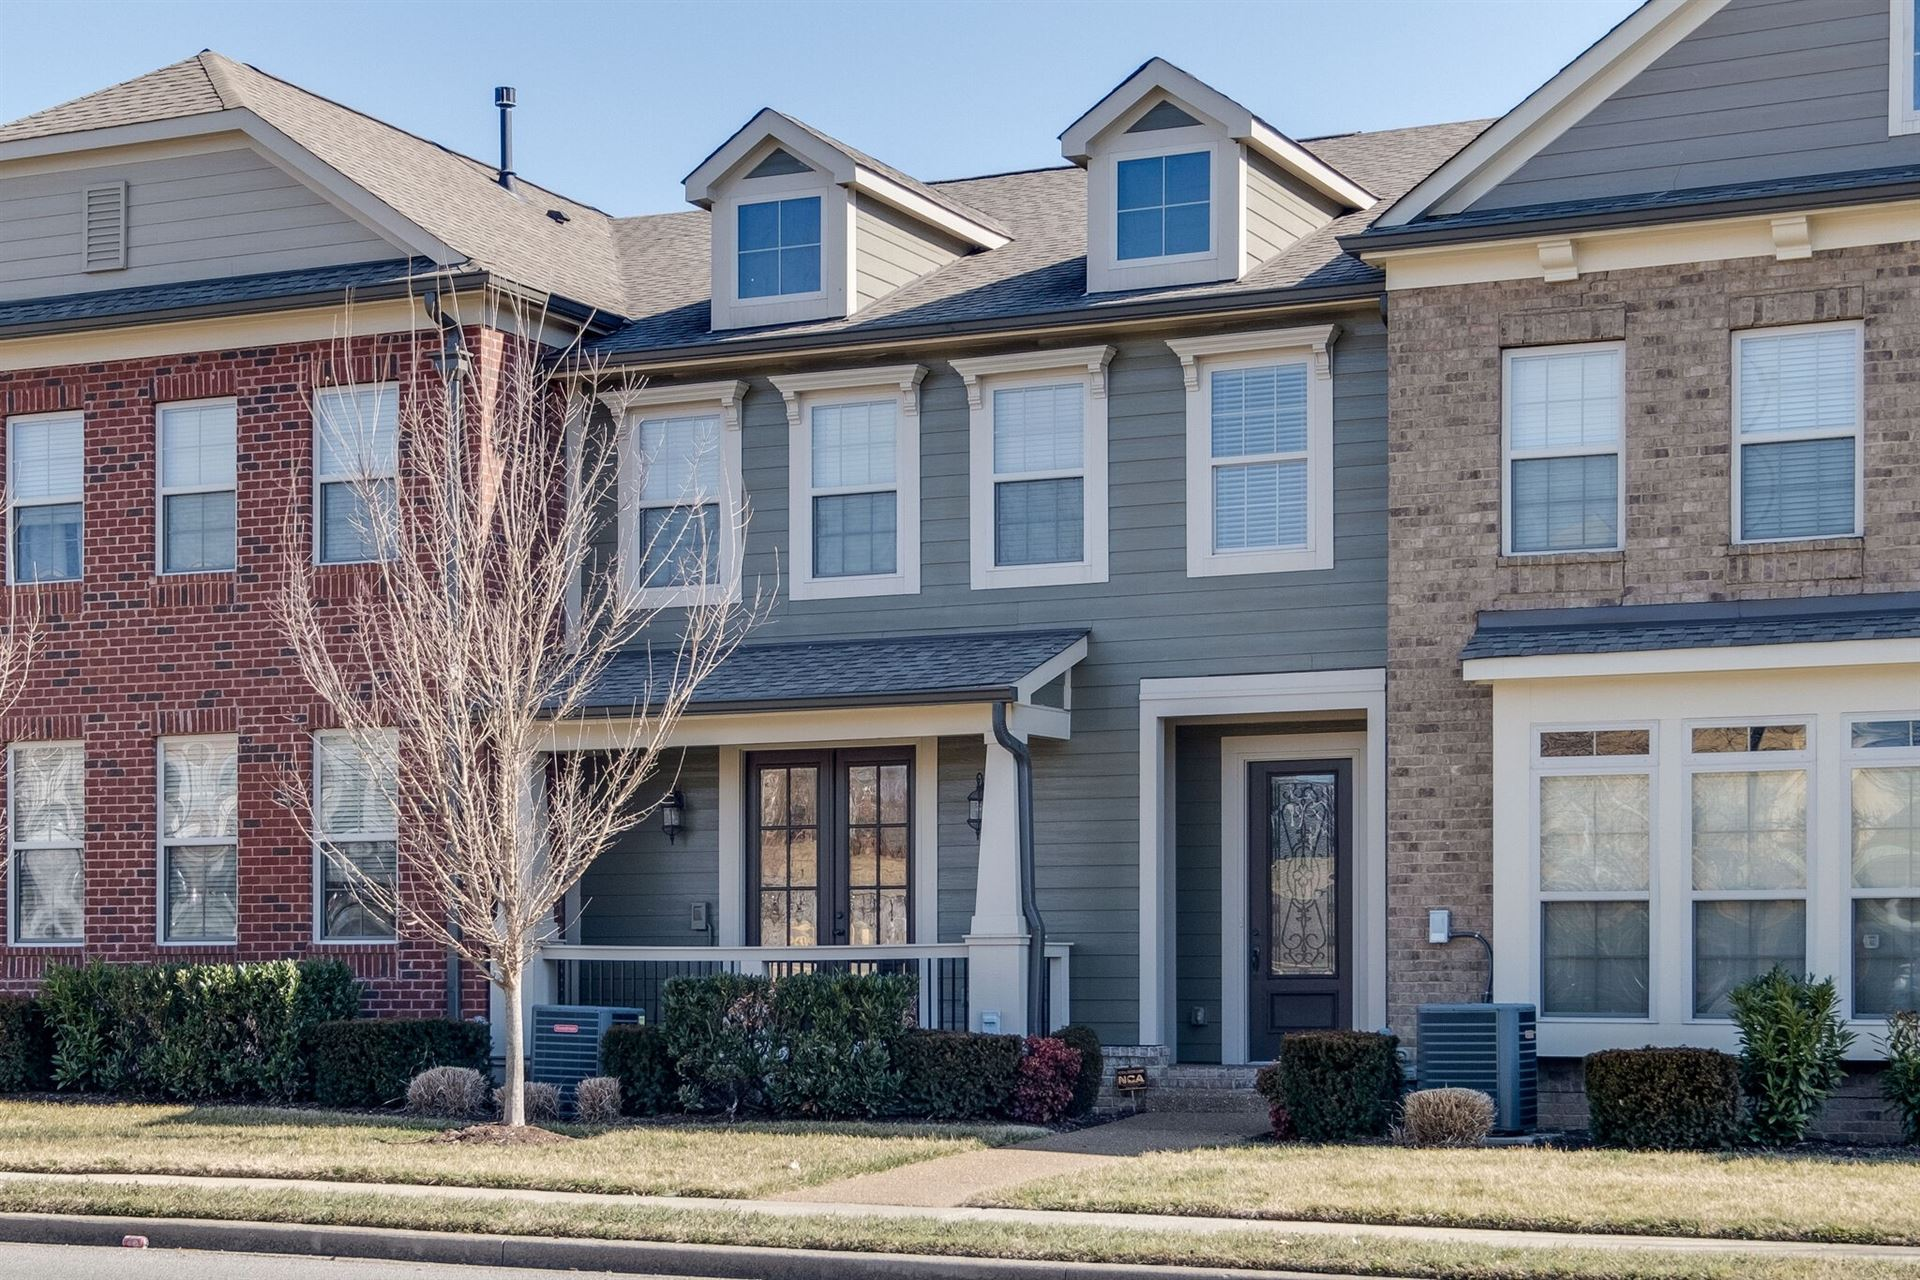 1110 Smokewood Way, Nashville, TN 37221 - MLS#: 2231649